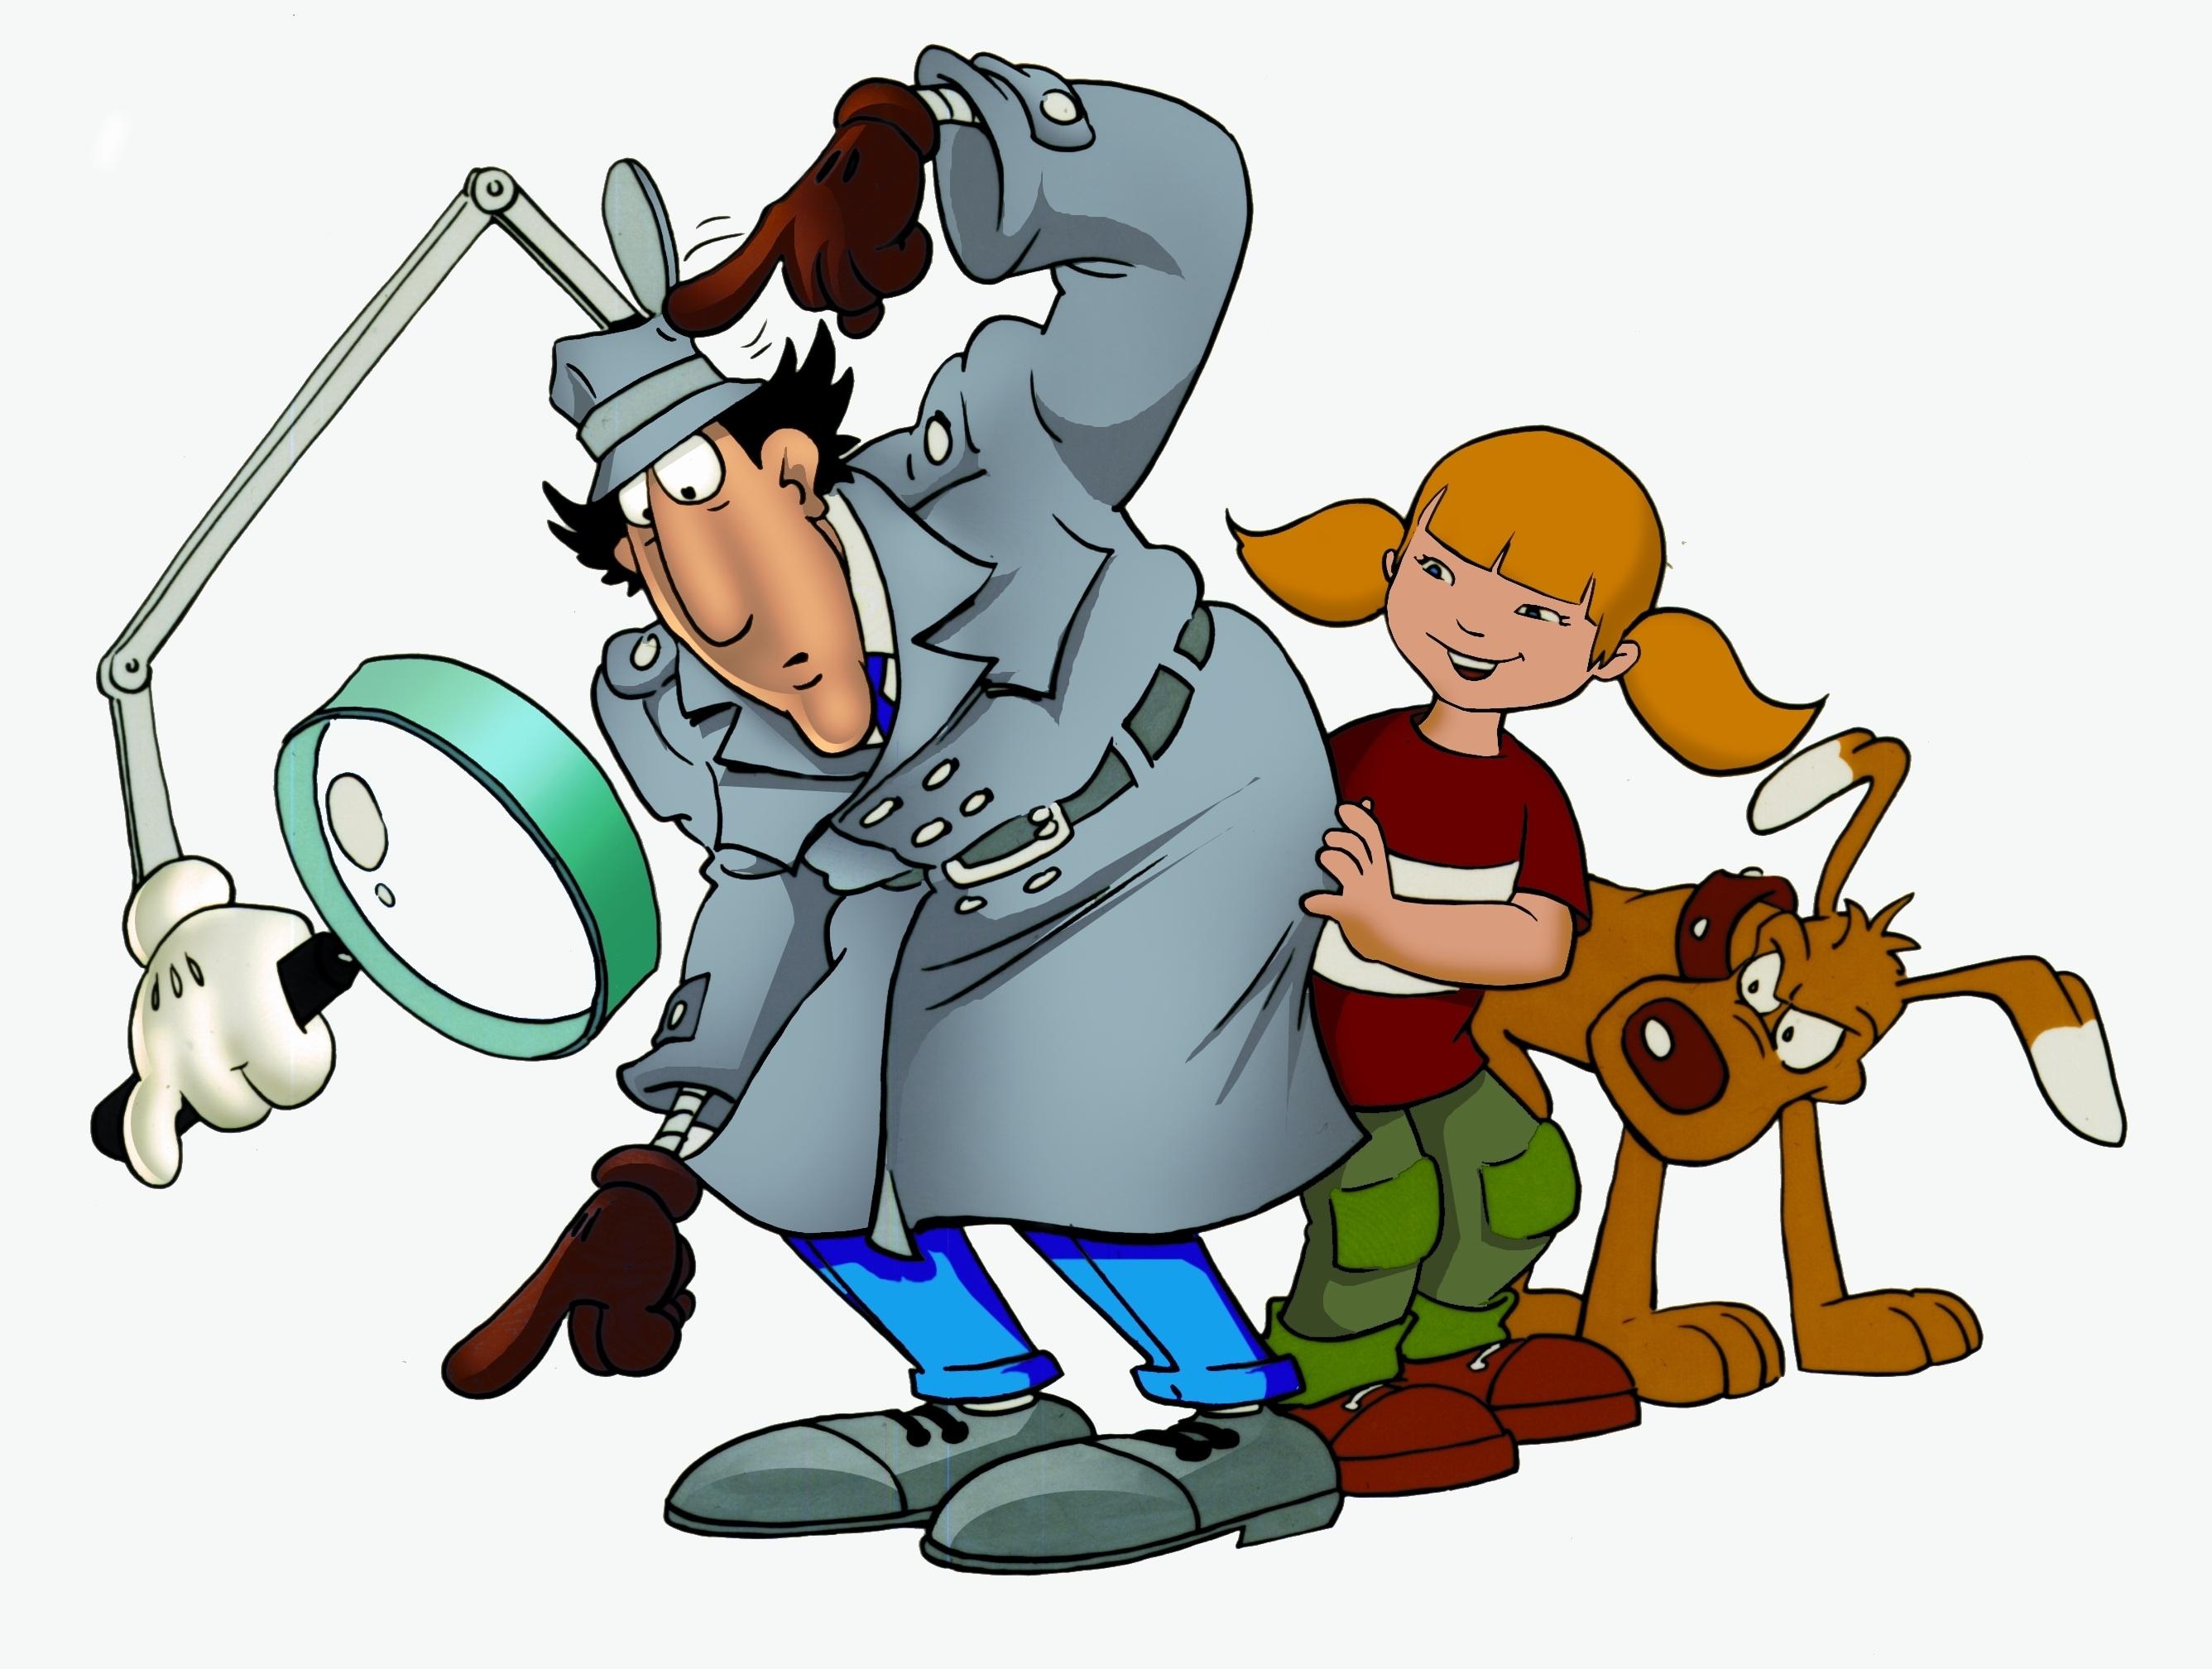 el inspector gadget 2015 - photo #16